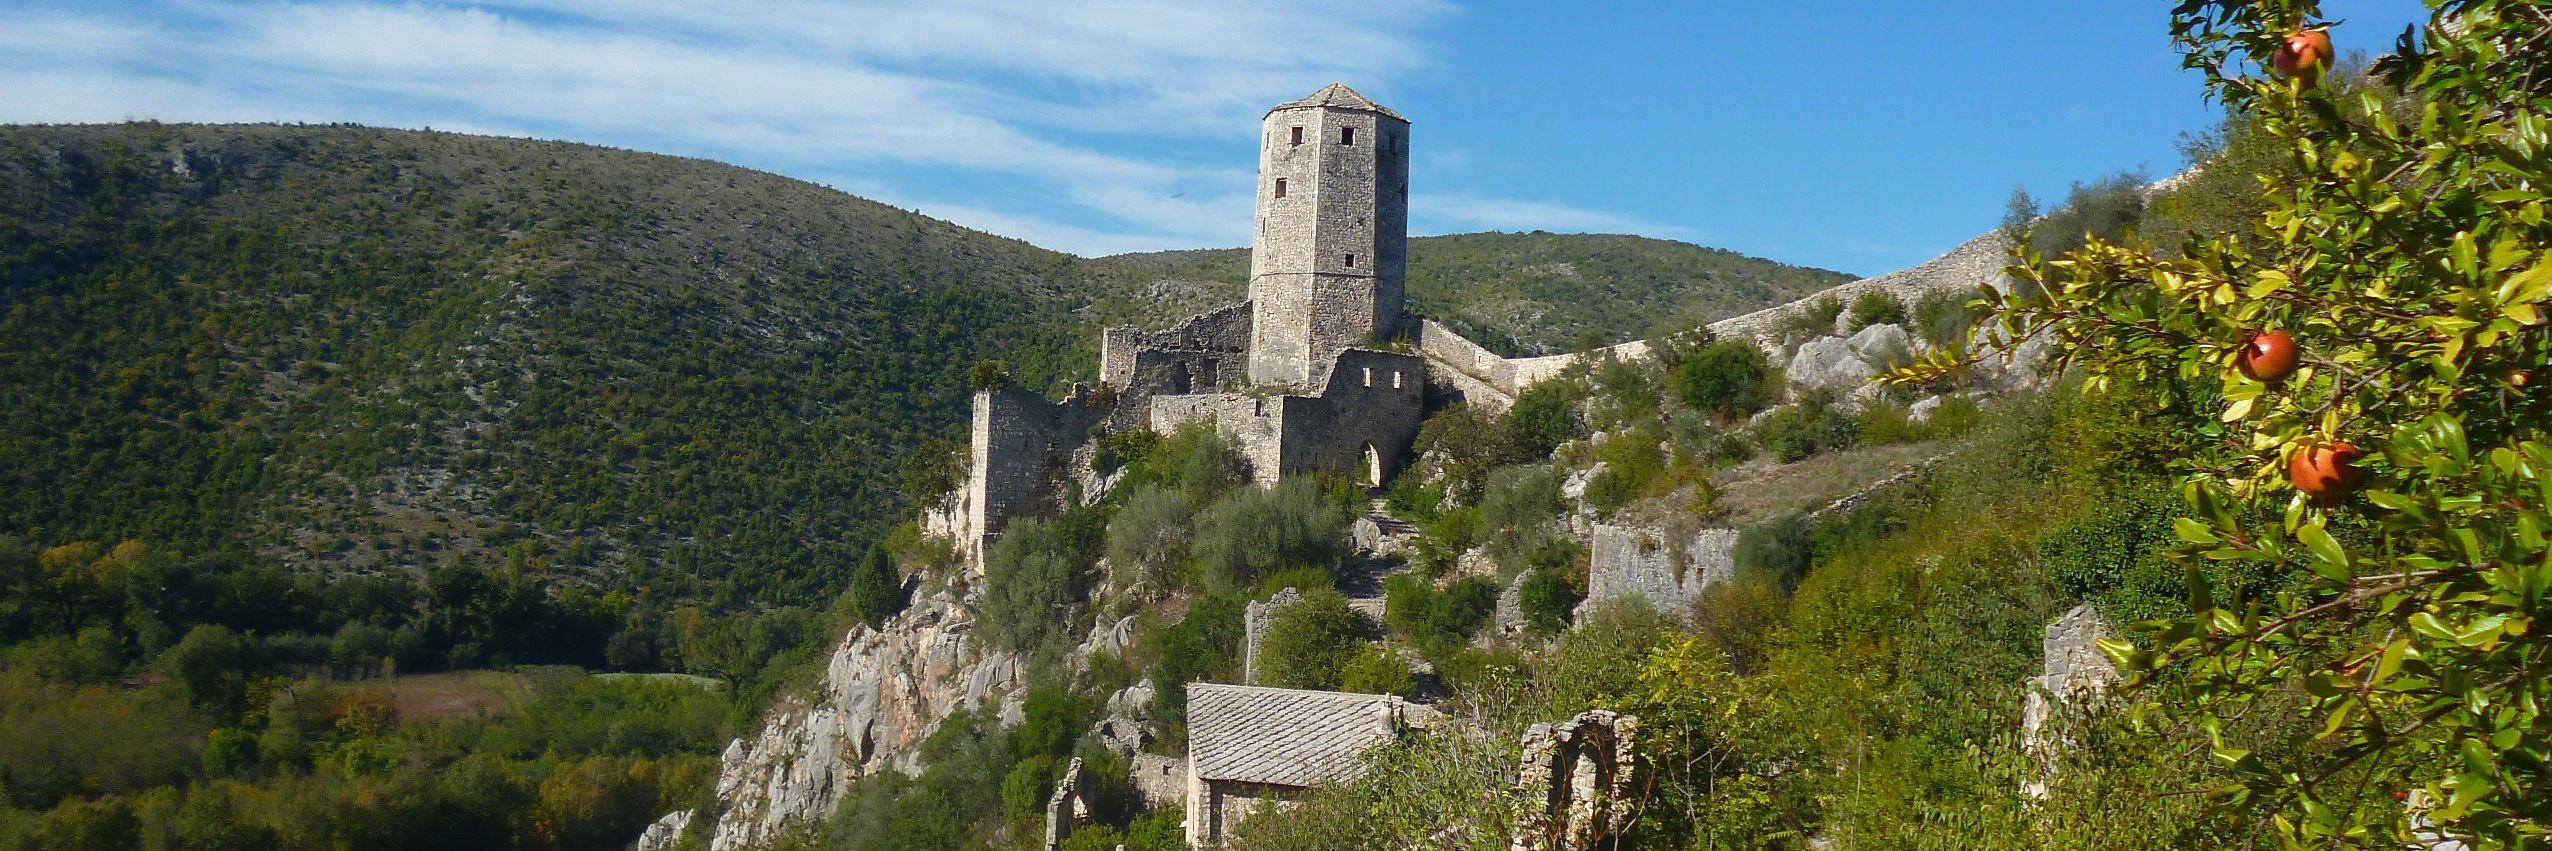 Башня капитана Гаврана